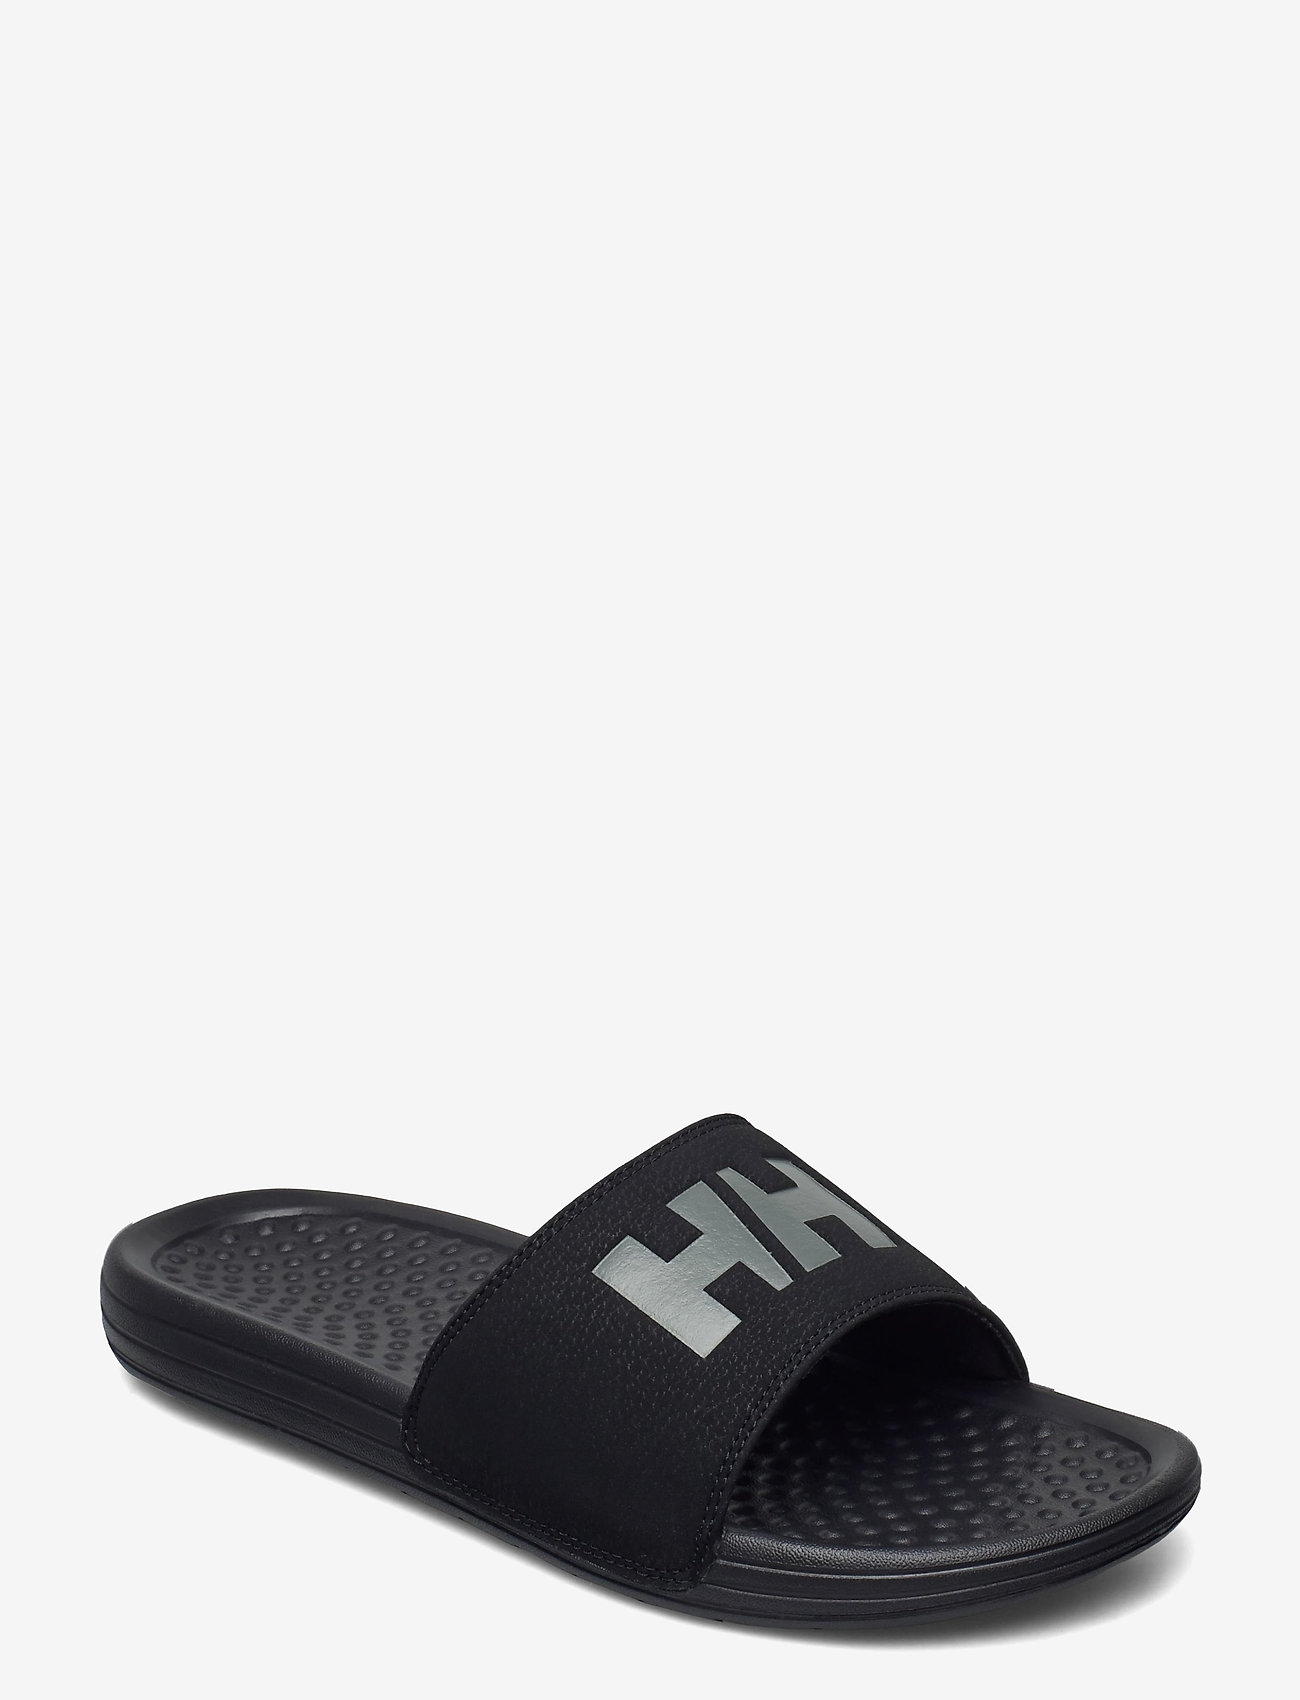 Helly Hansen - H/H SLIDE - pool sliders - 990 black / gunmetal - 0